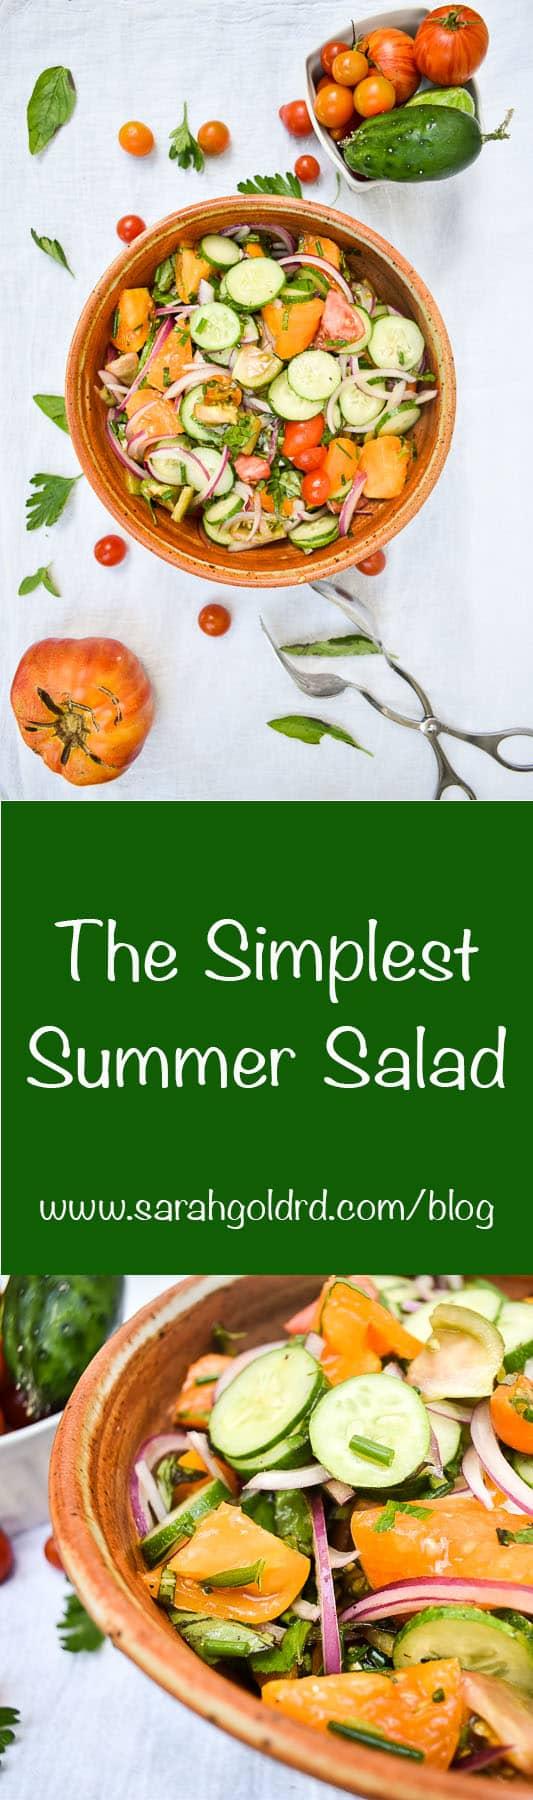 Simple Summer Salad Pinterest.jpg